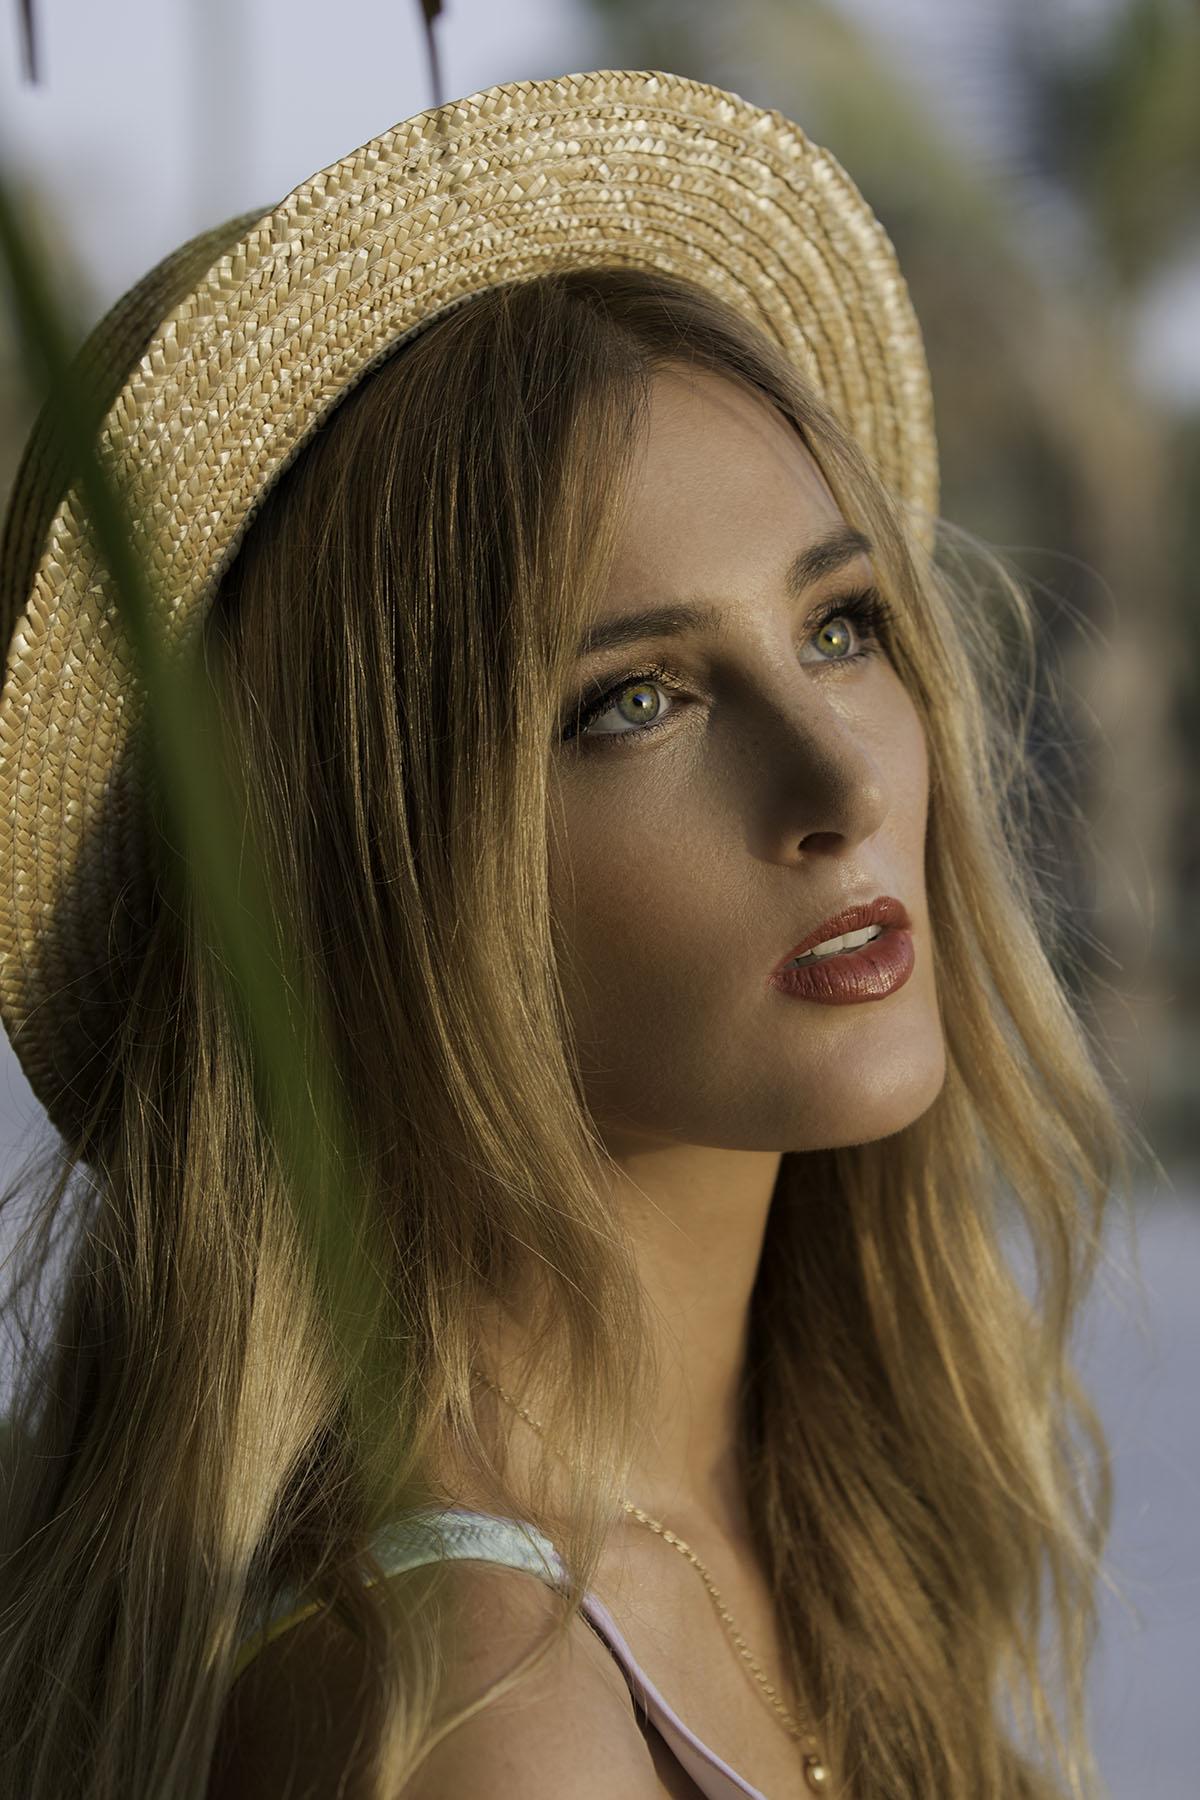 Boho beach fashion shoot with Tess Roozen by Loesje Kessels Fashion Photographer Dubai